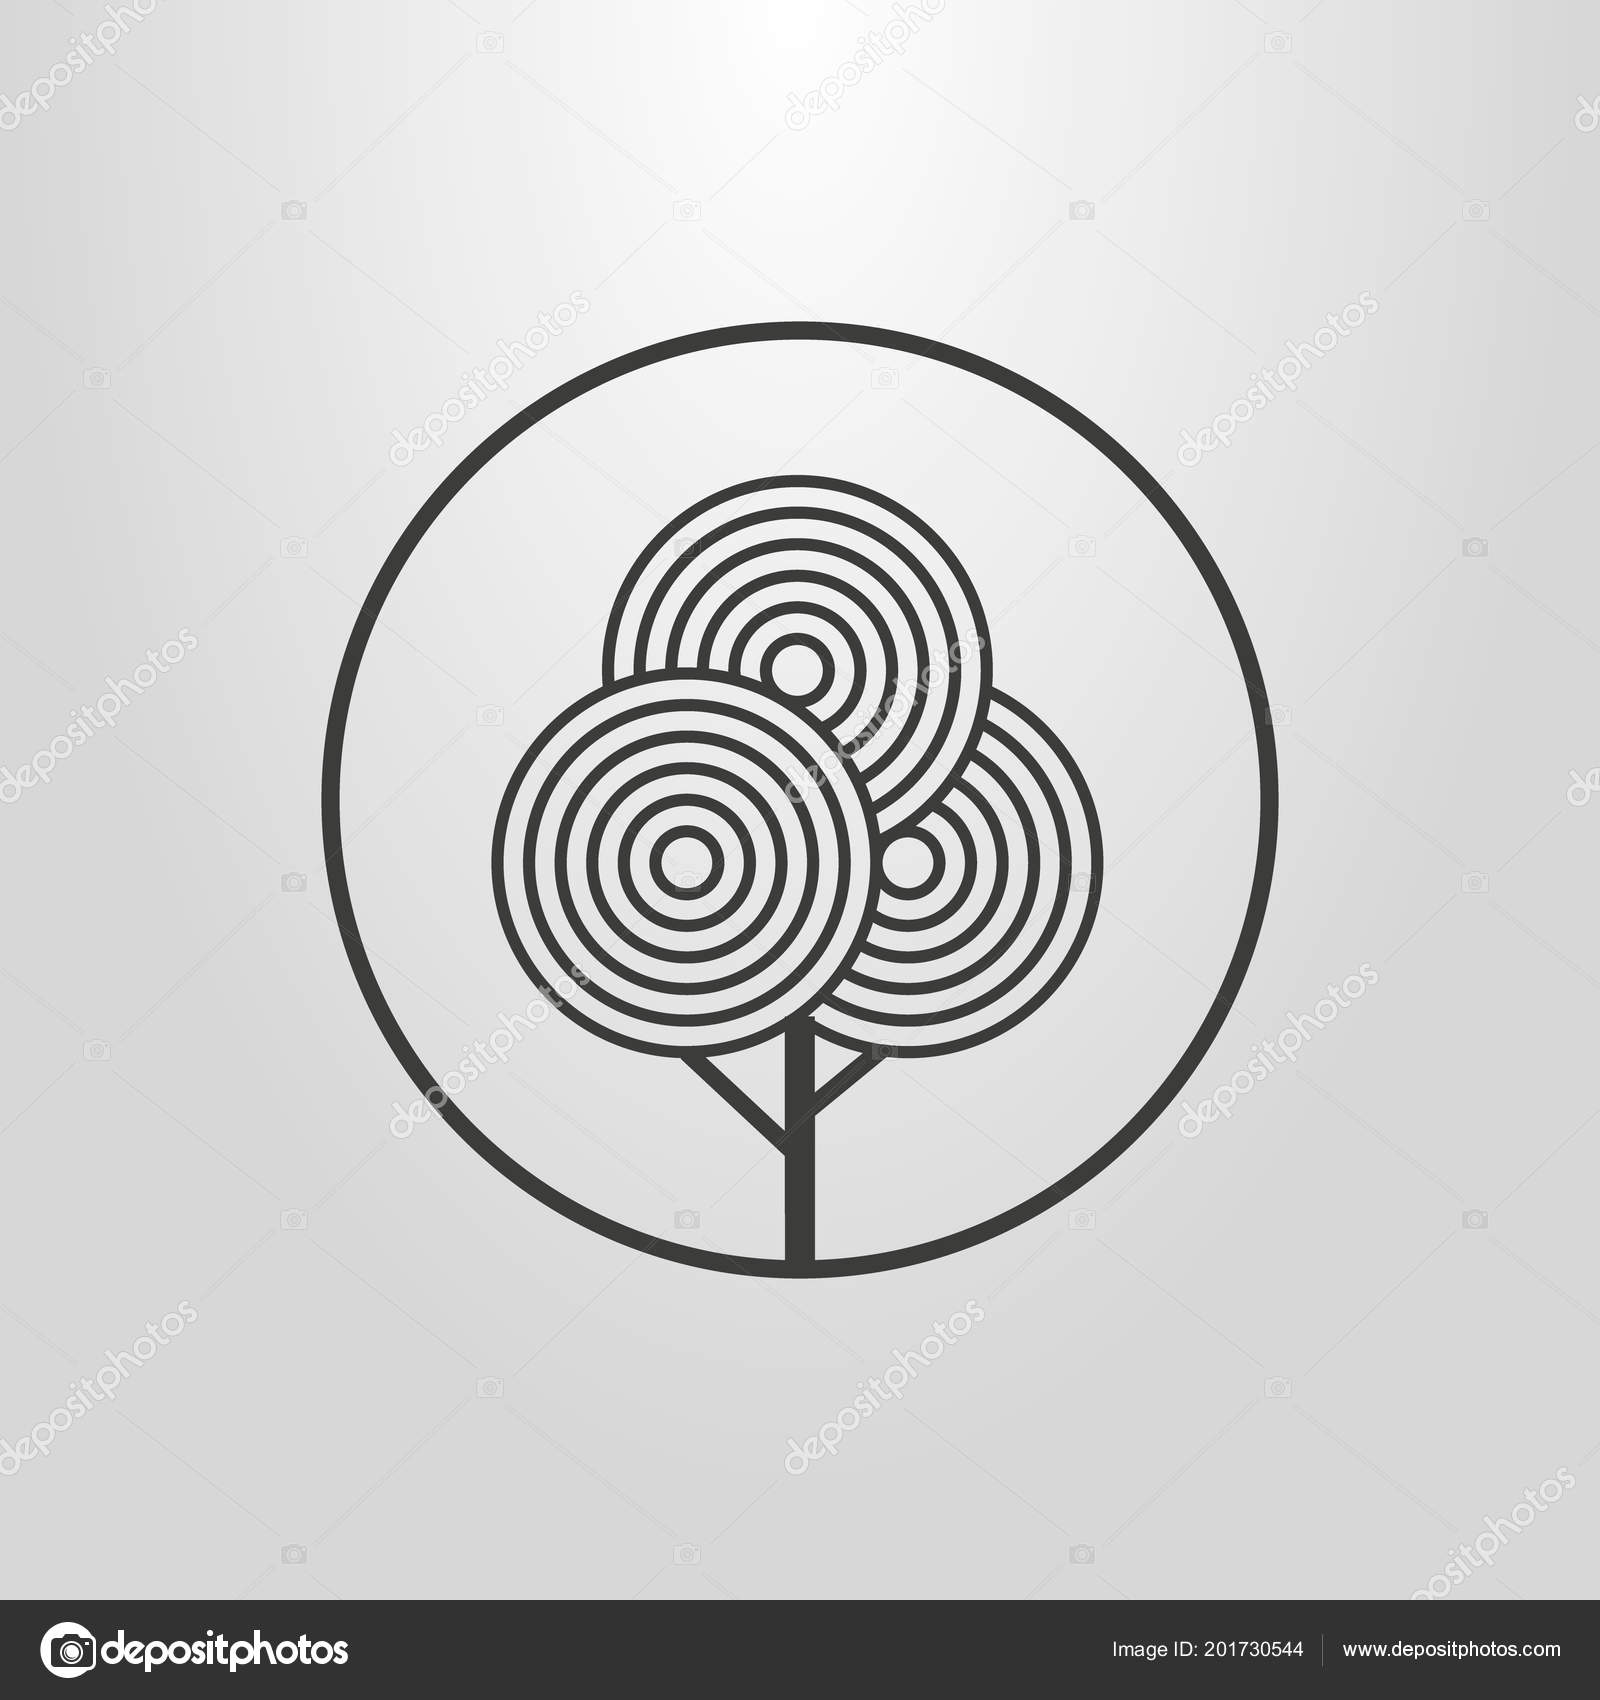 Black White Line Art Abstract Geometric Pictogram Tree Frame ...